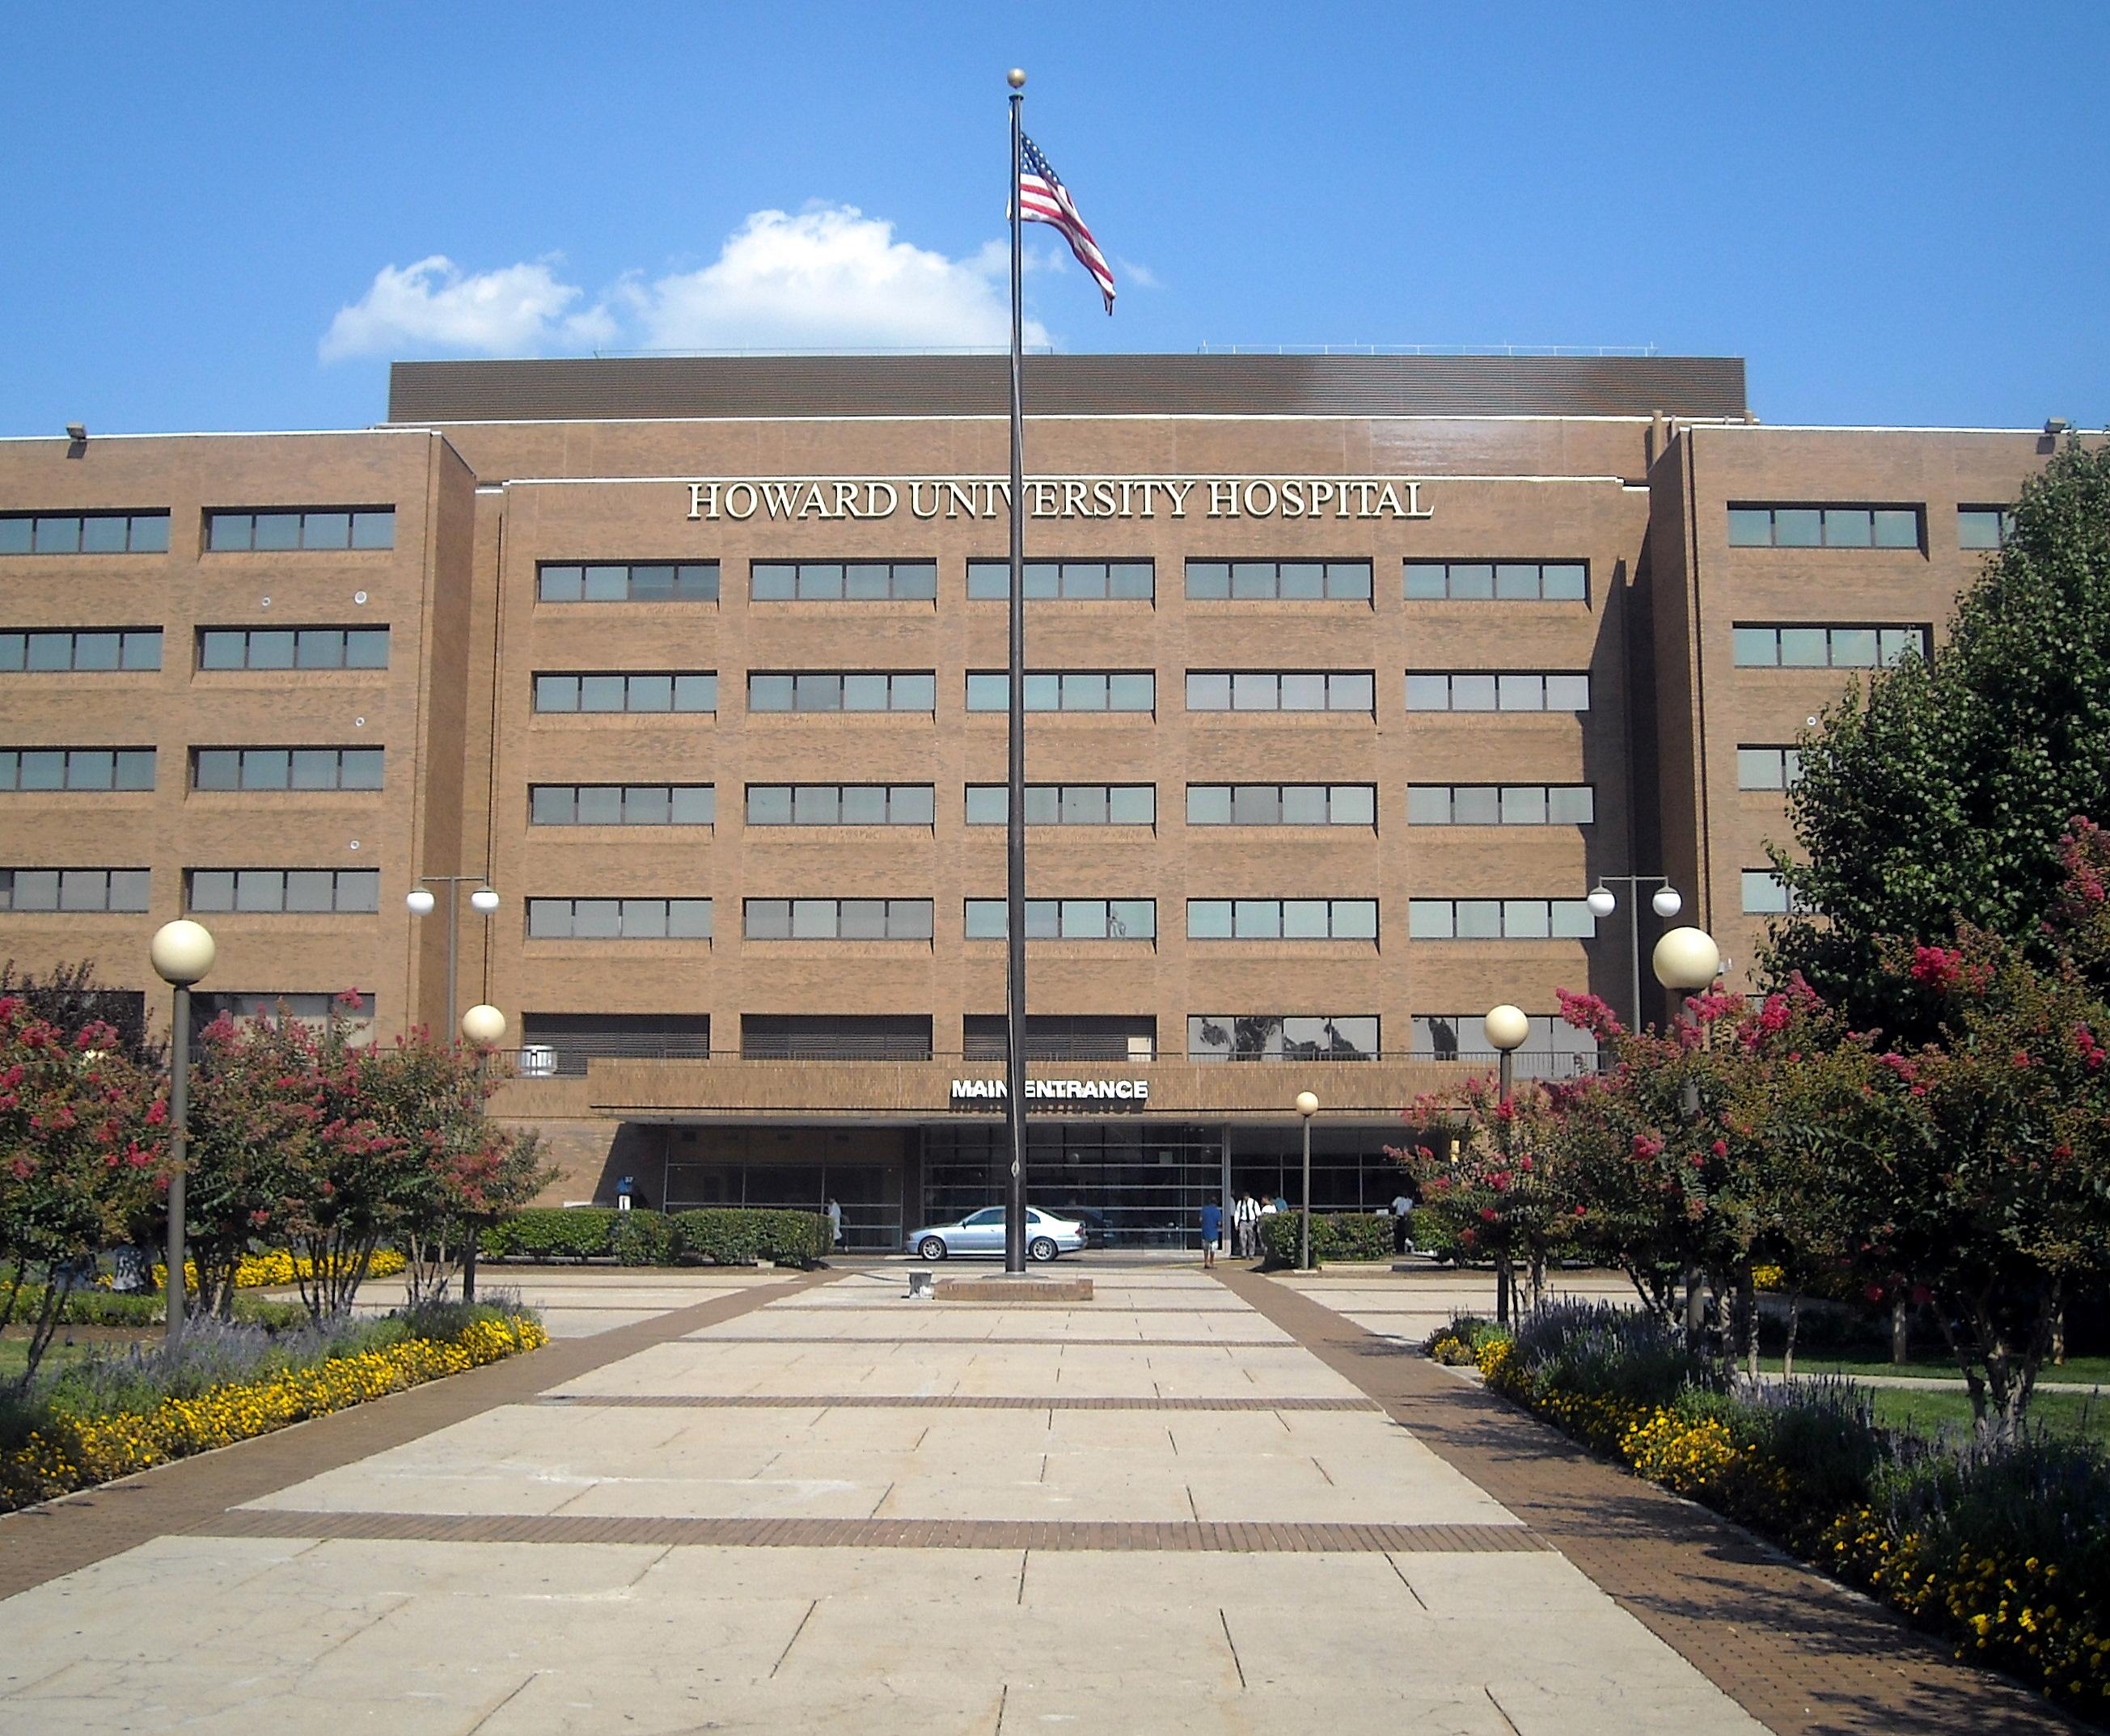 File:Howard University Hospital.jpg - Wikipedia